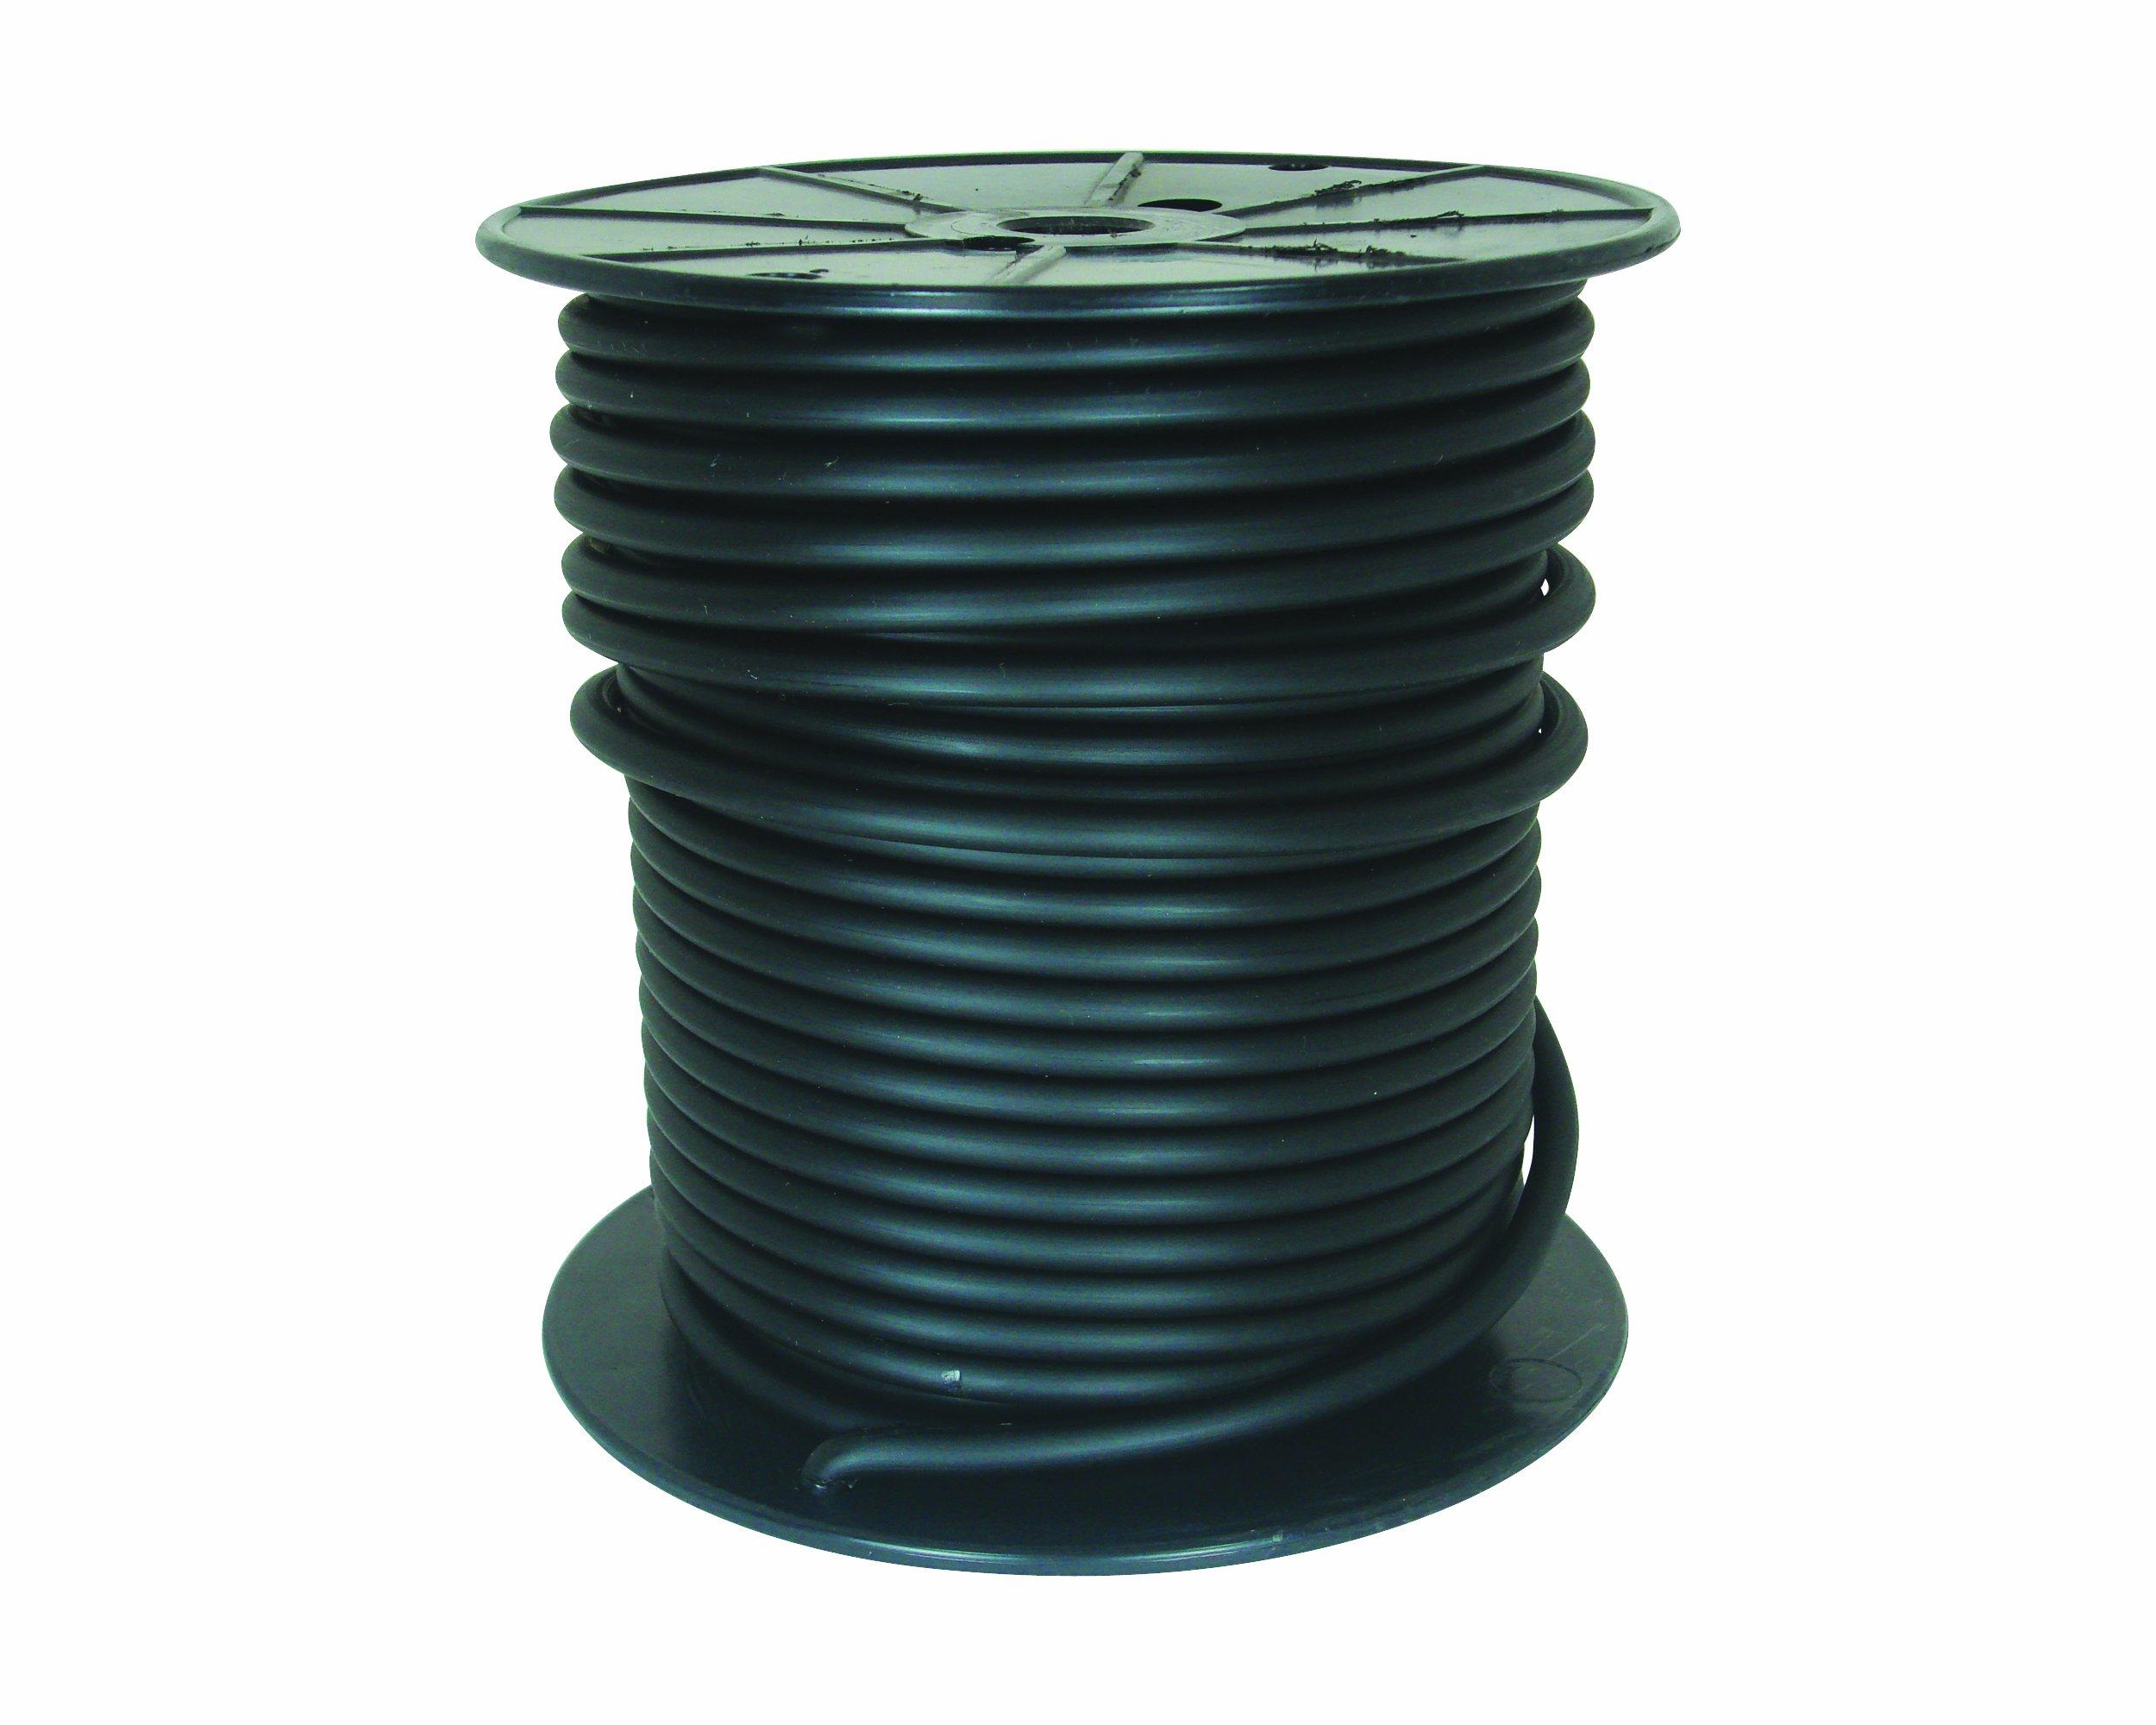 Field Guardian 12.5-Guage Undergate Aluminum Cable, 150-Feet Spool by Field Guardian